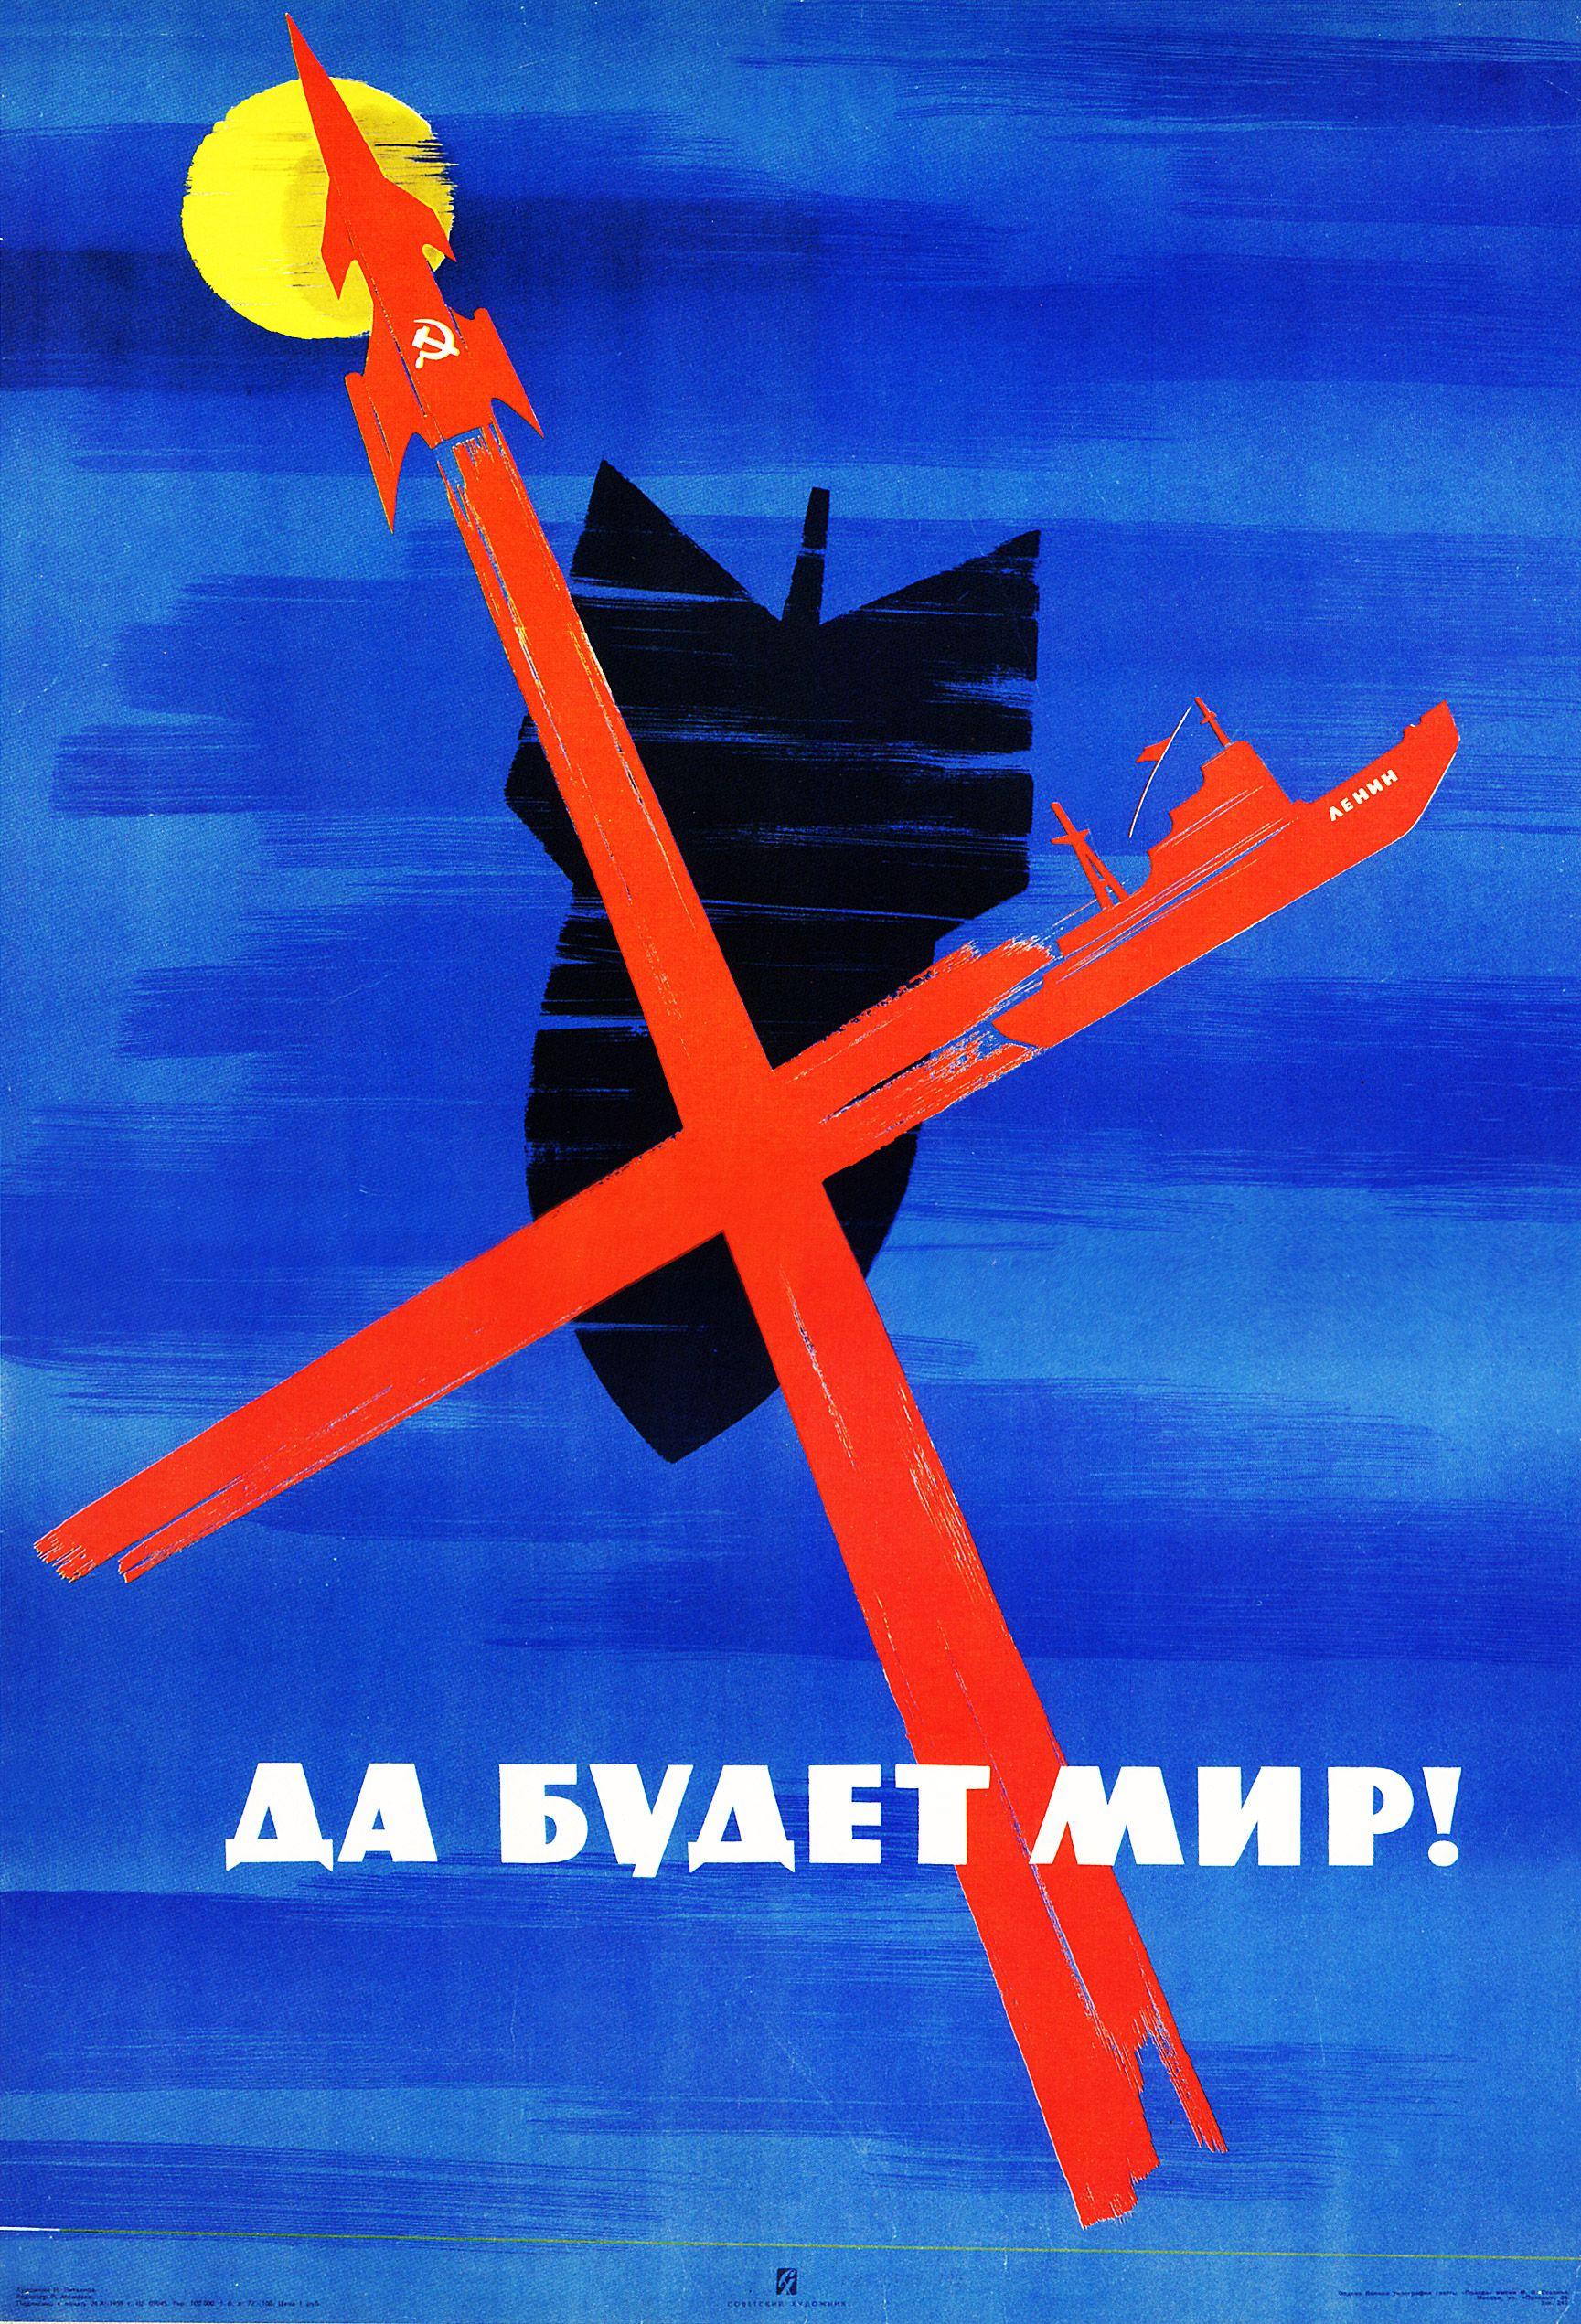 Soviet space program propaganda poster 16